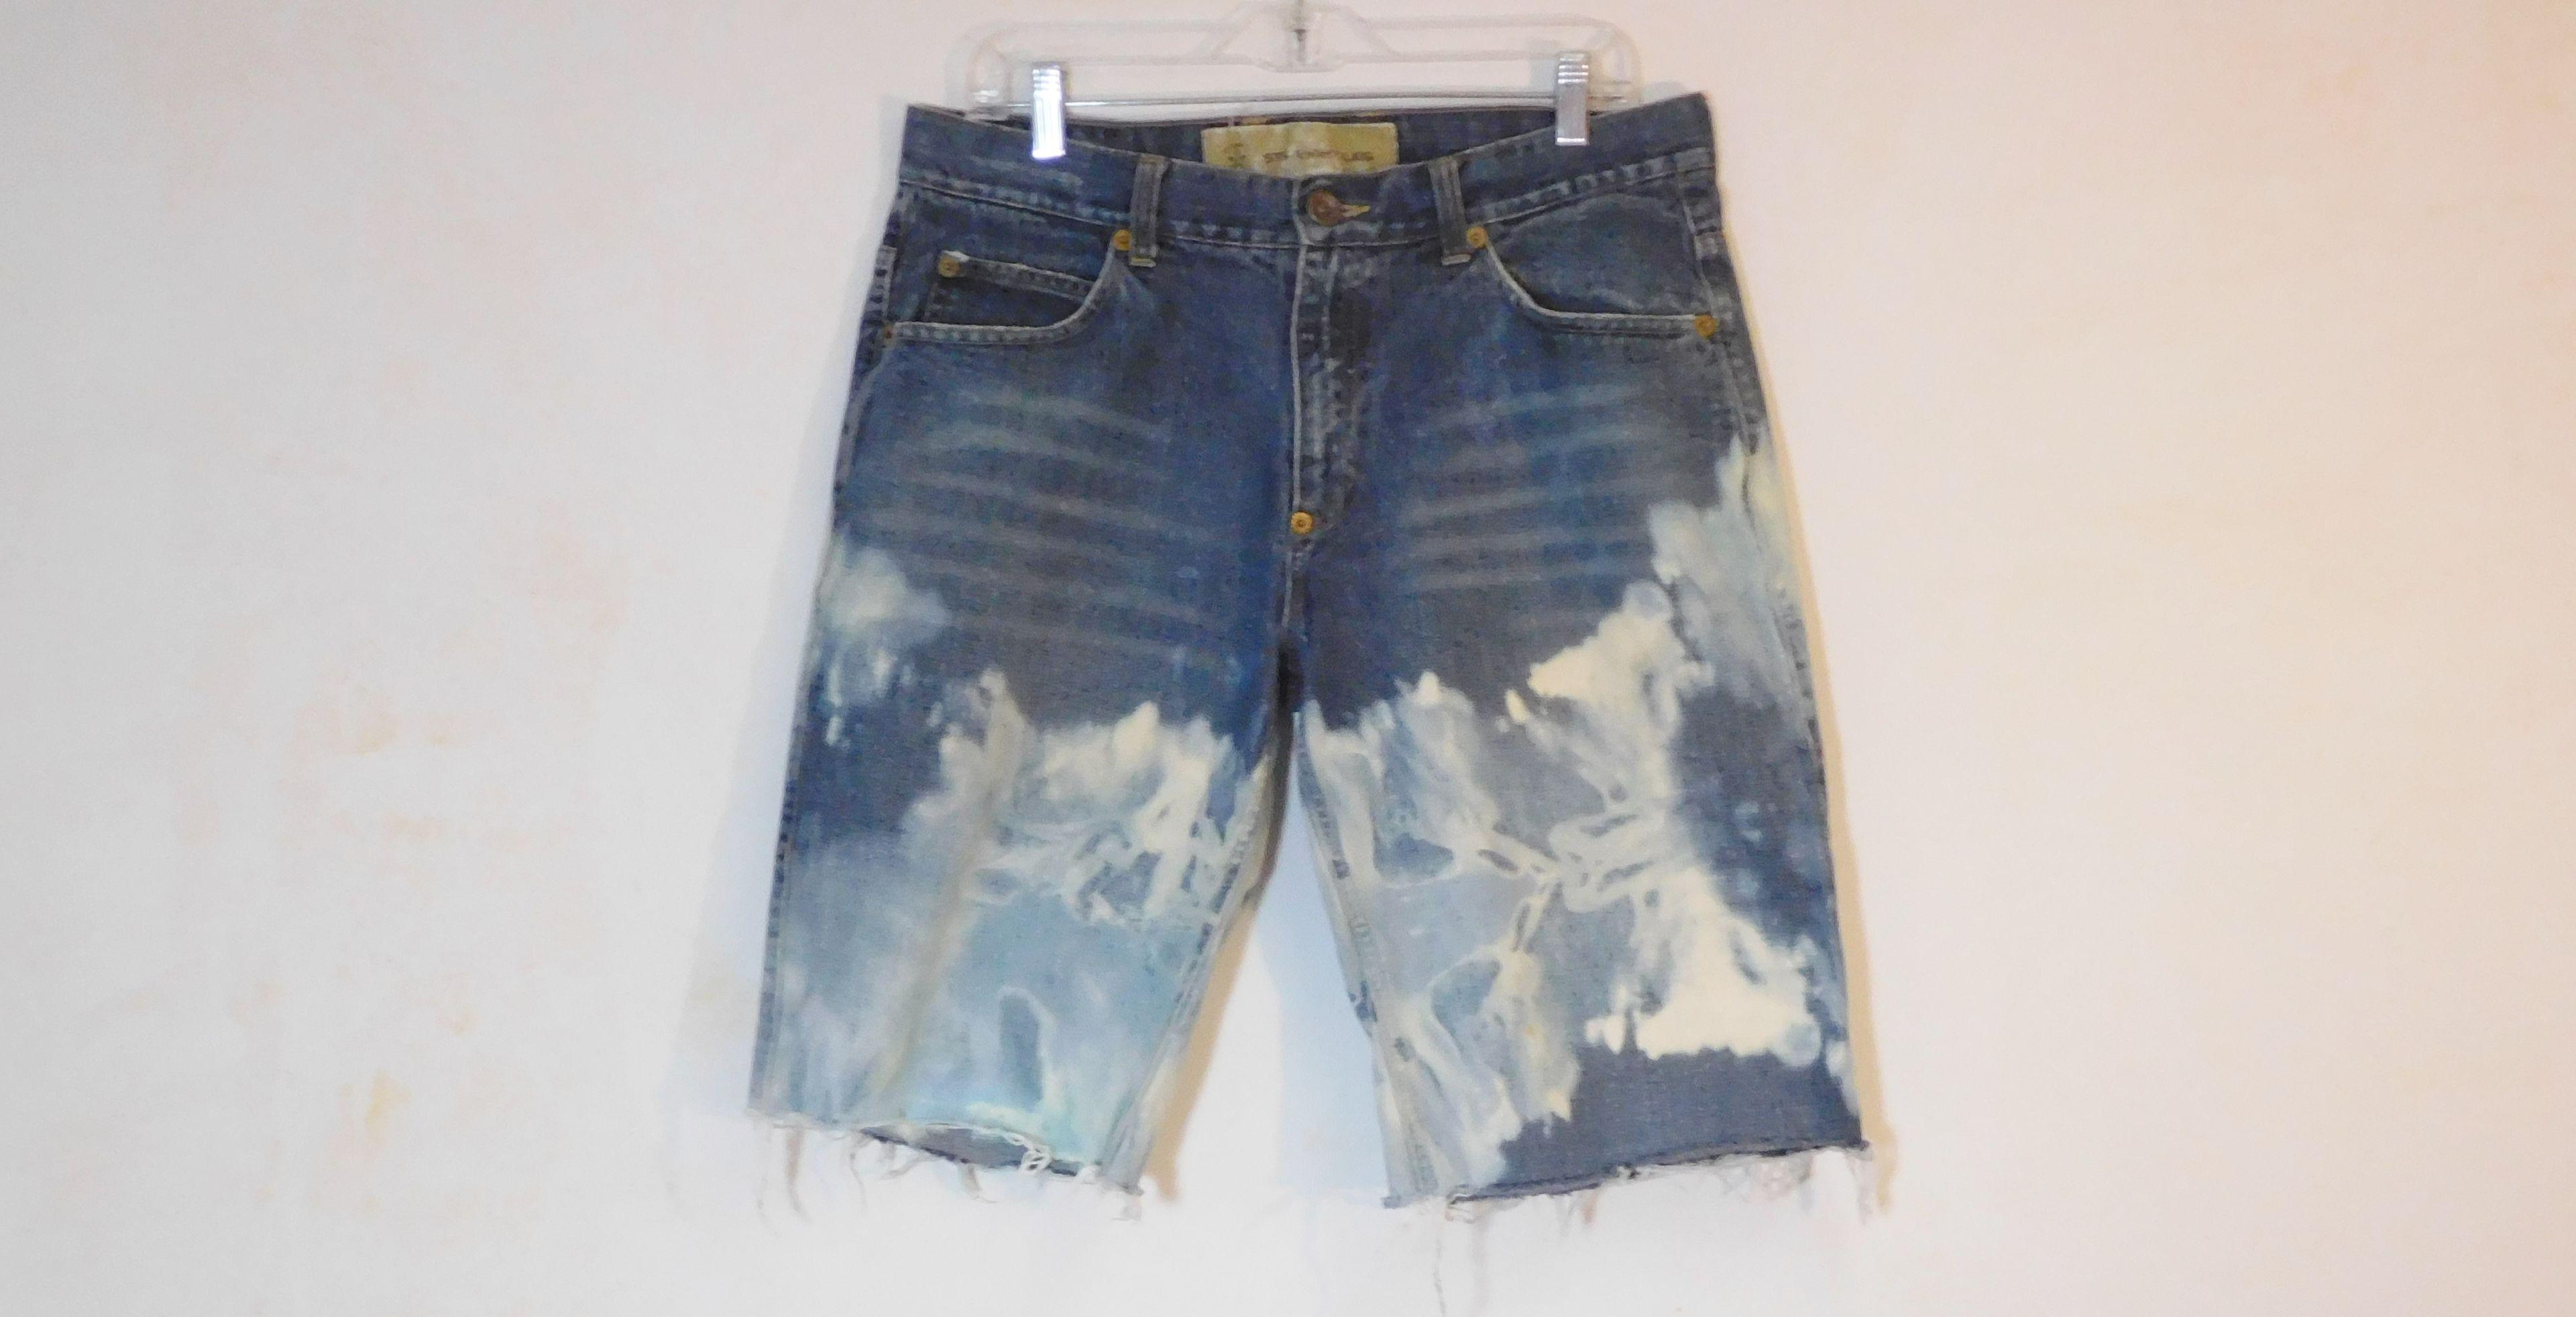 Hombre Casual Ripped Holes Short Jeans Estampado de flores Roll up Denim Shorts Azul r4VnSV